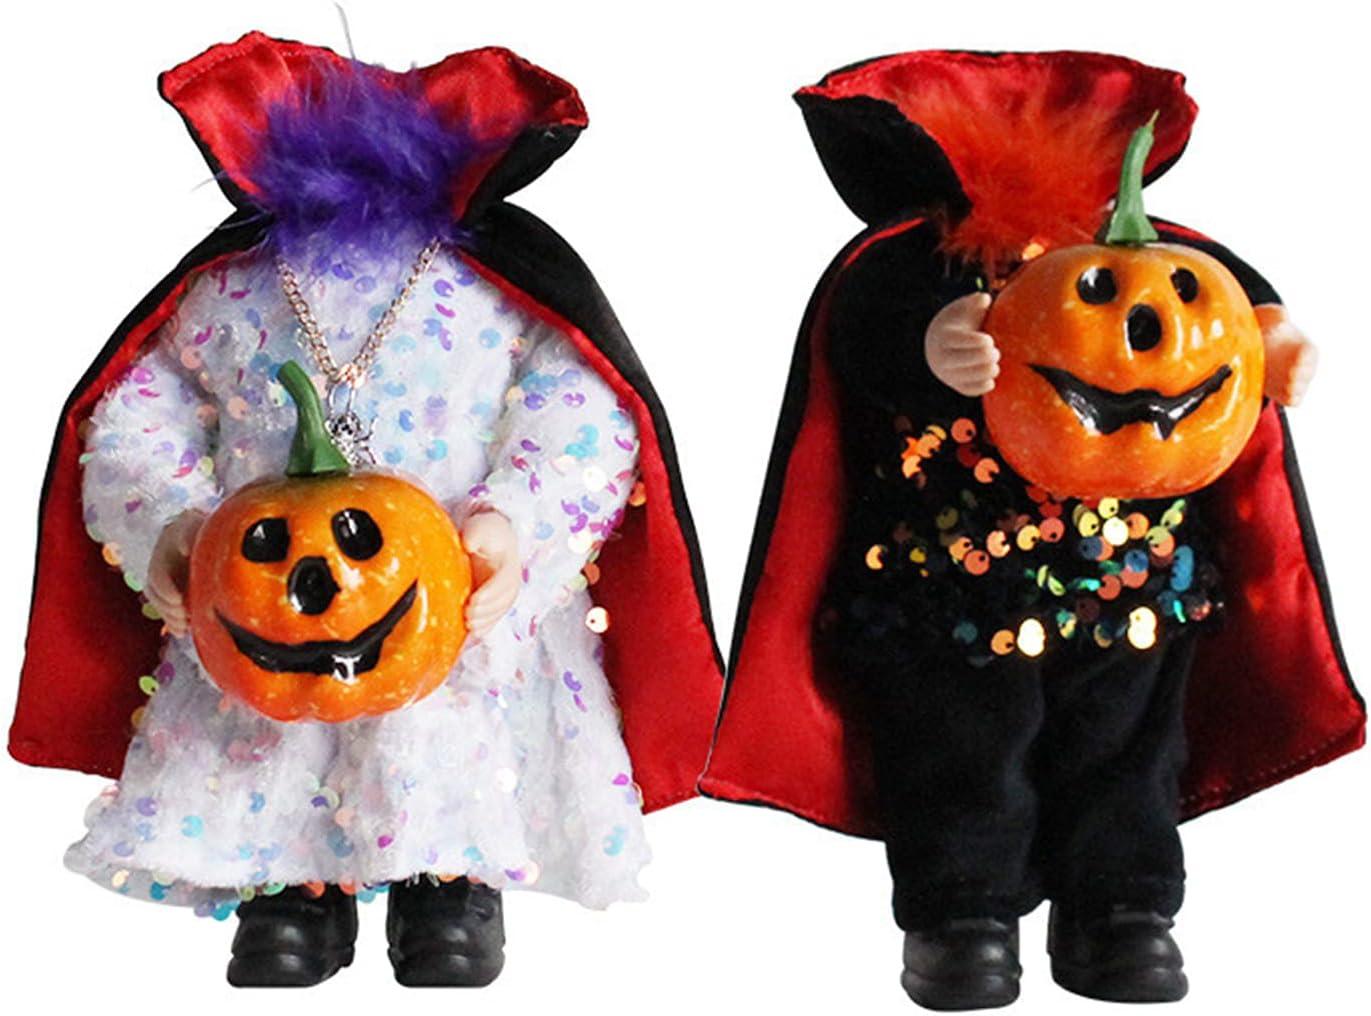 2 Pcs Halloween Gnomes Plush Reservation Handmade Direct stock discount Table Decor Pumpkin H Doll